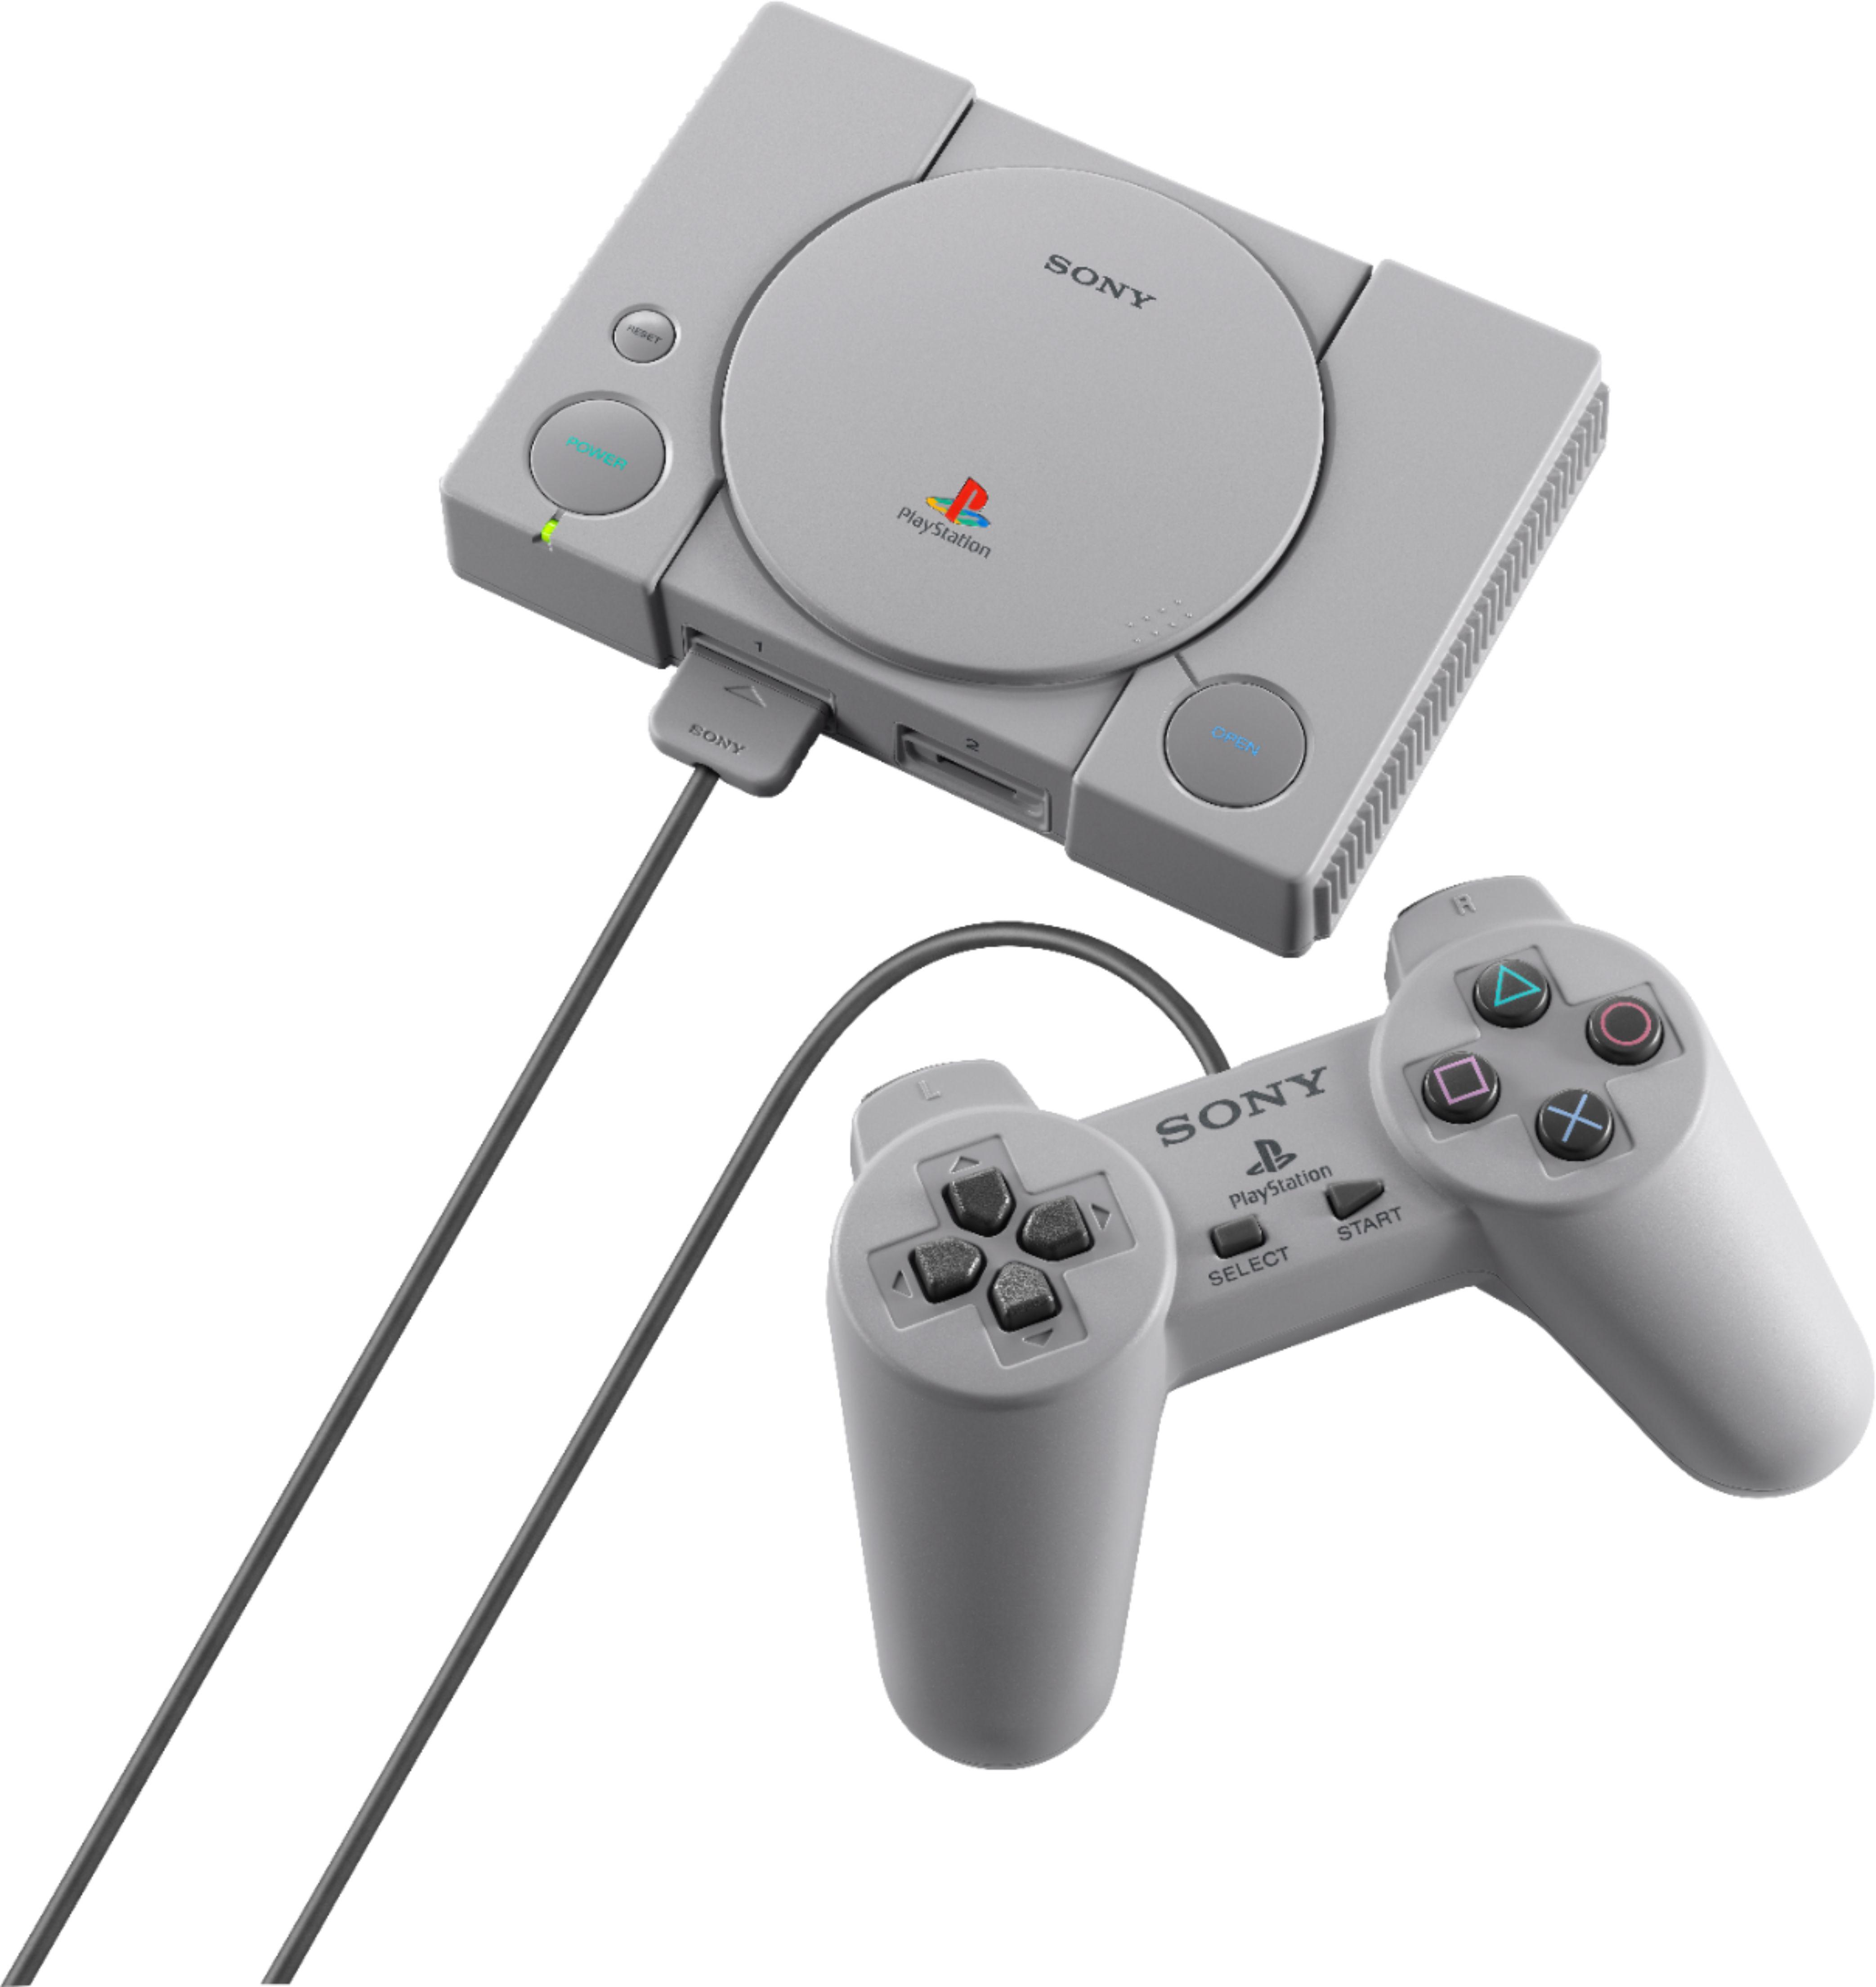 Playstation Classic Target 19 49 + Tax YMMV After PM & Cartwheel